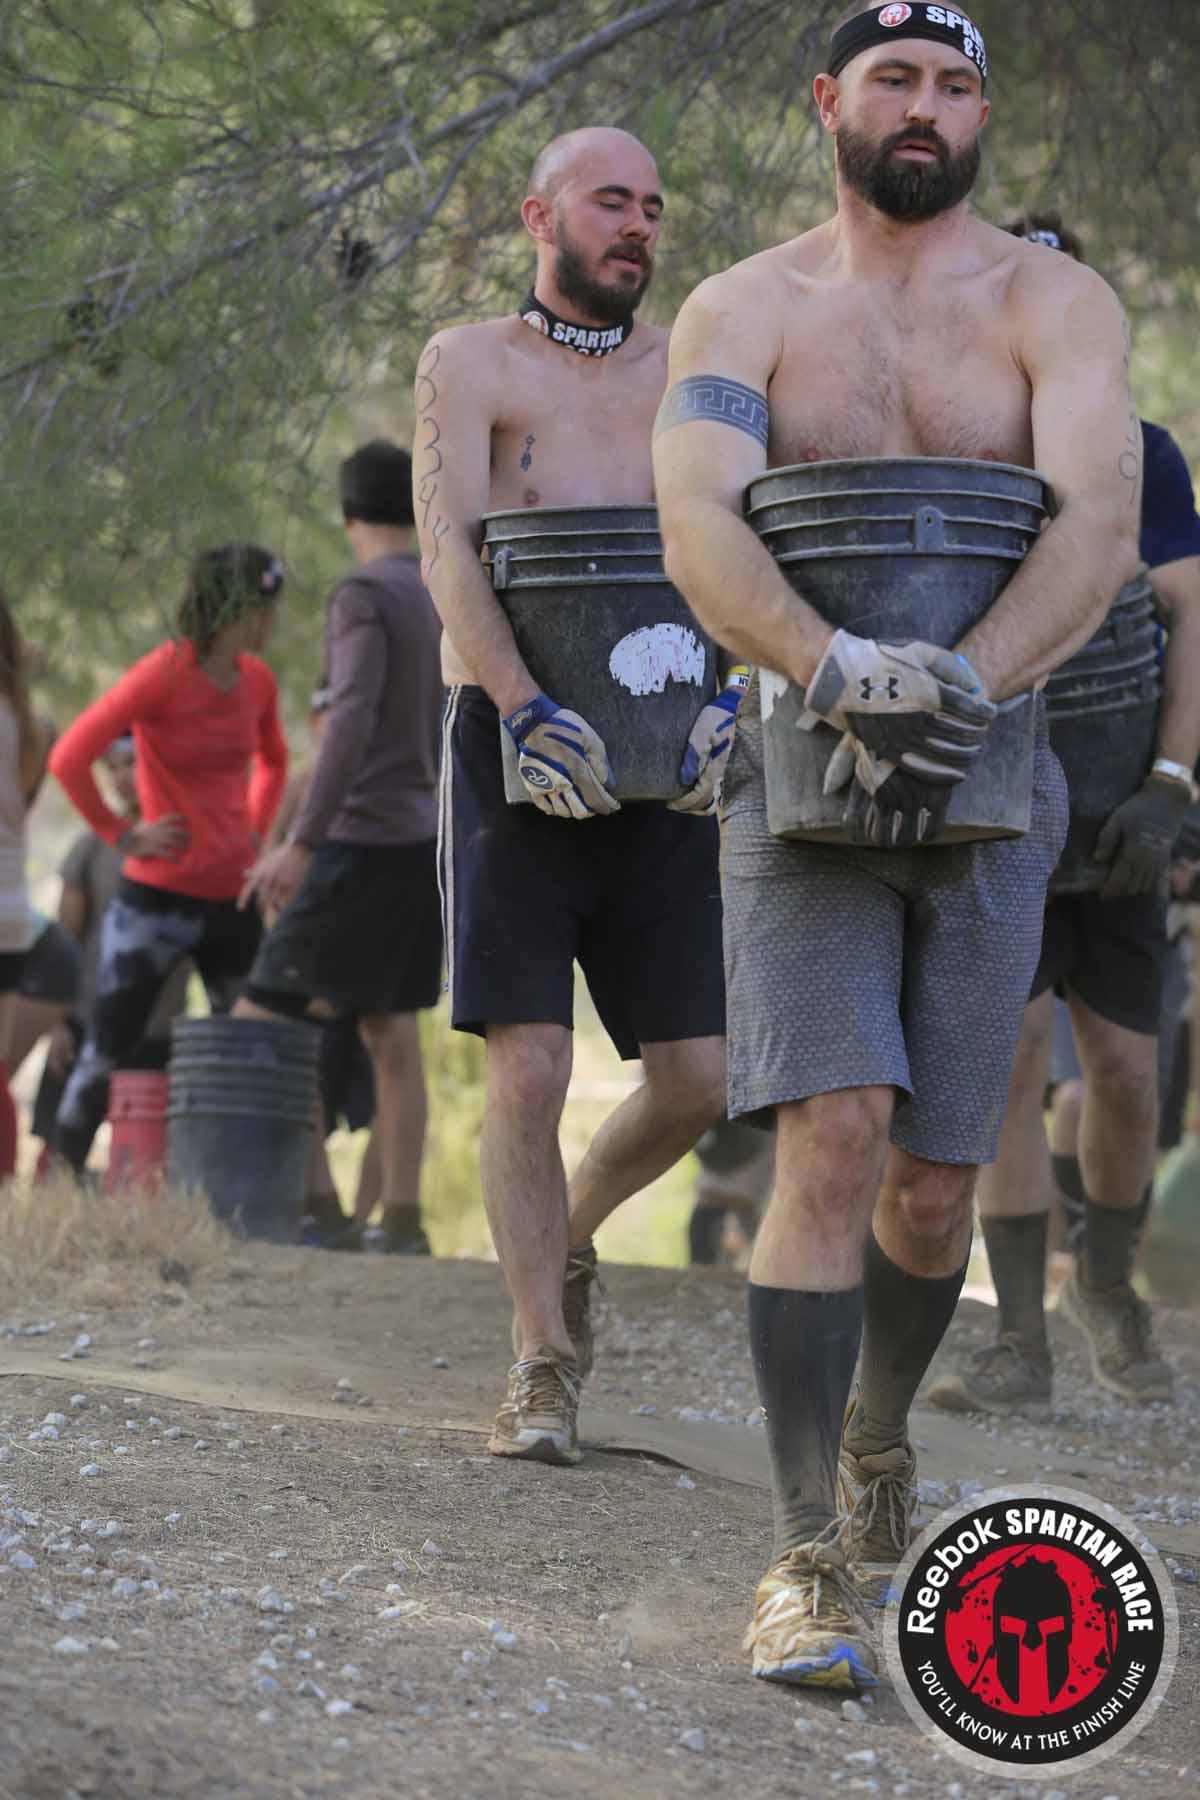 Spartan Sprint, bucket haul